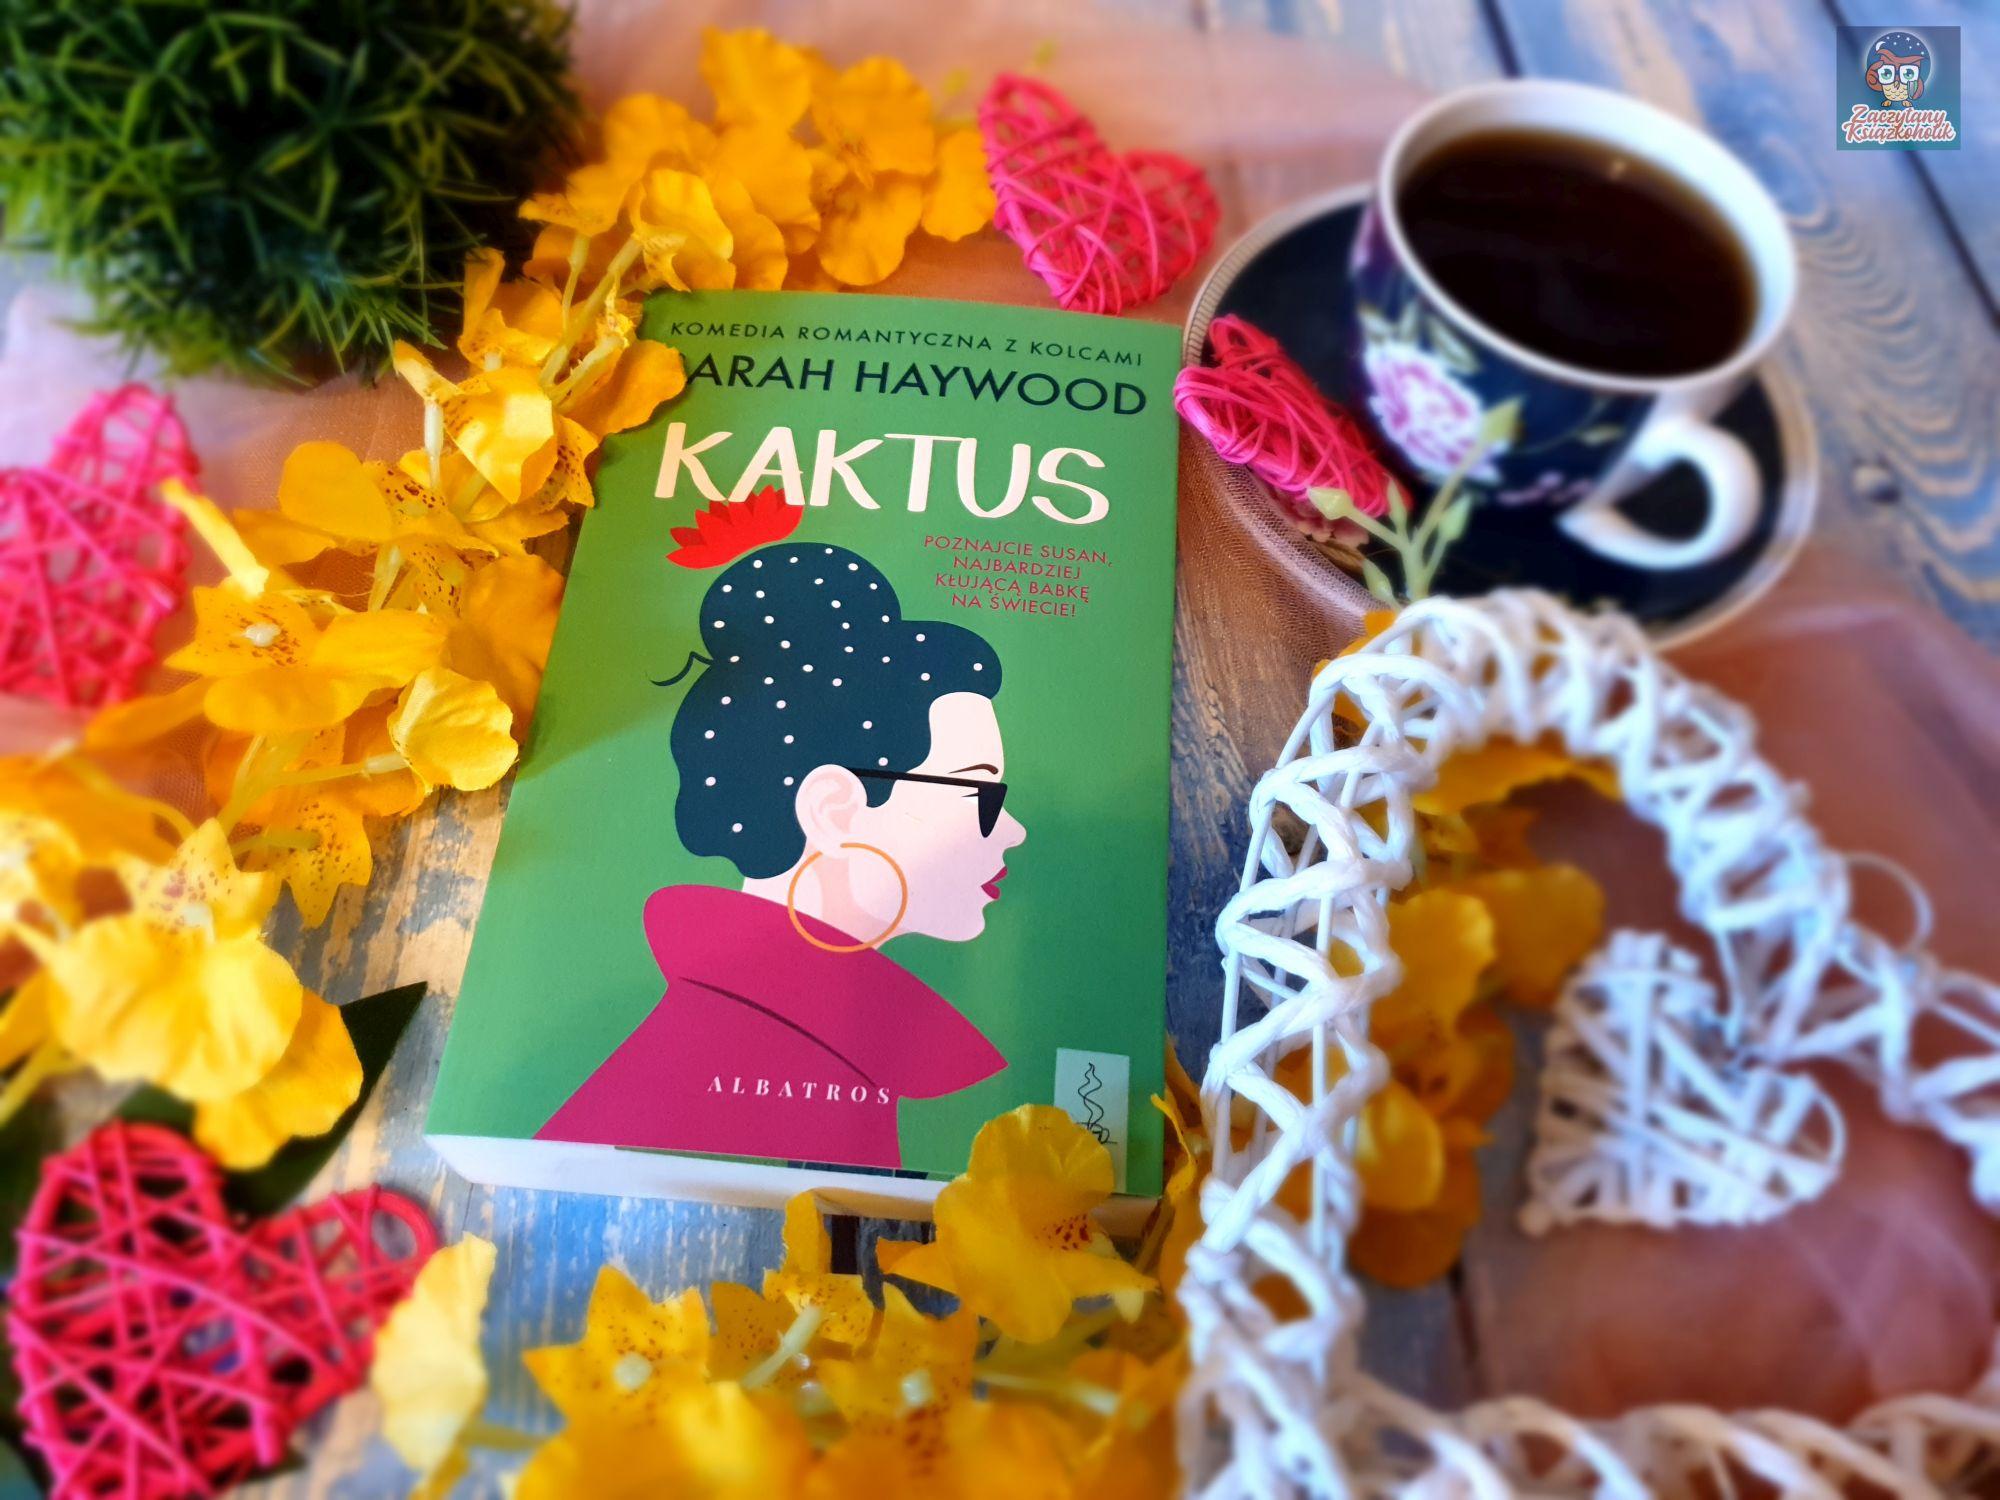 Kaktus, Sarah Haywood, zaczytanyksiazkoholik.pl